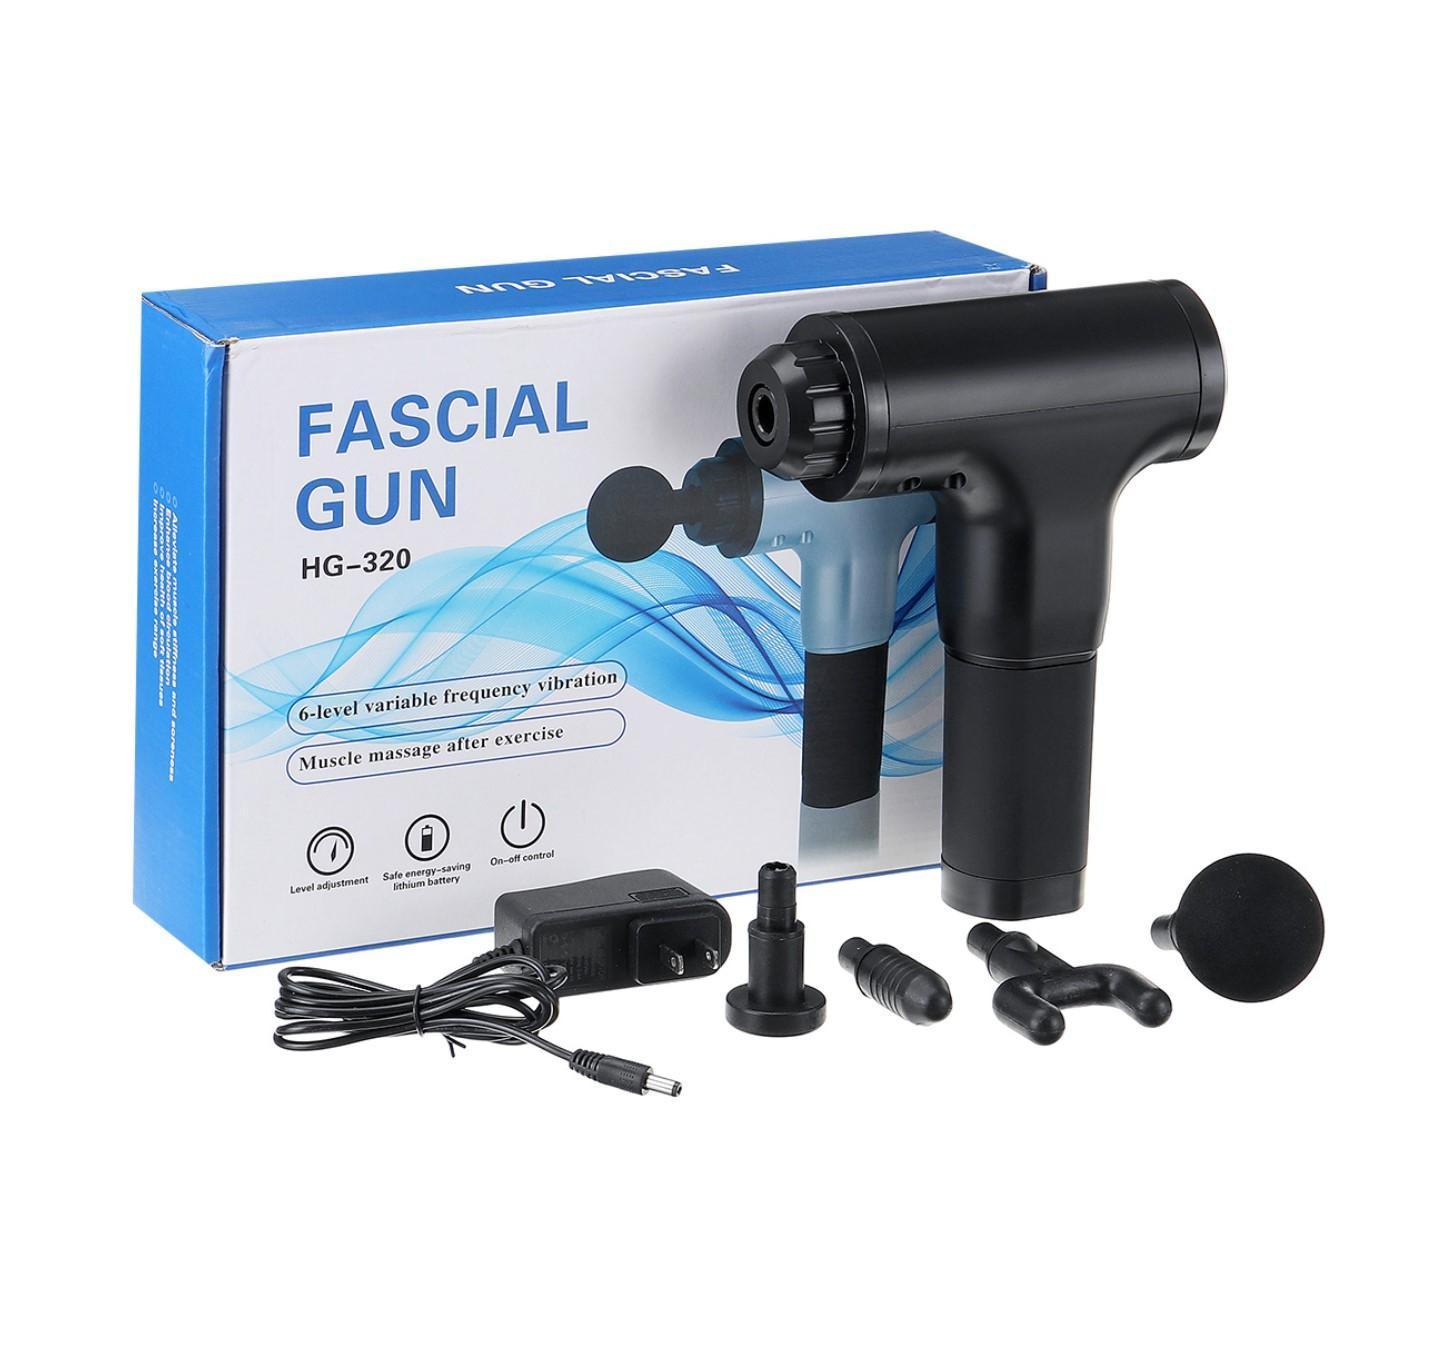 Image result for massage fascia gun HG-320 FHDZ